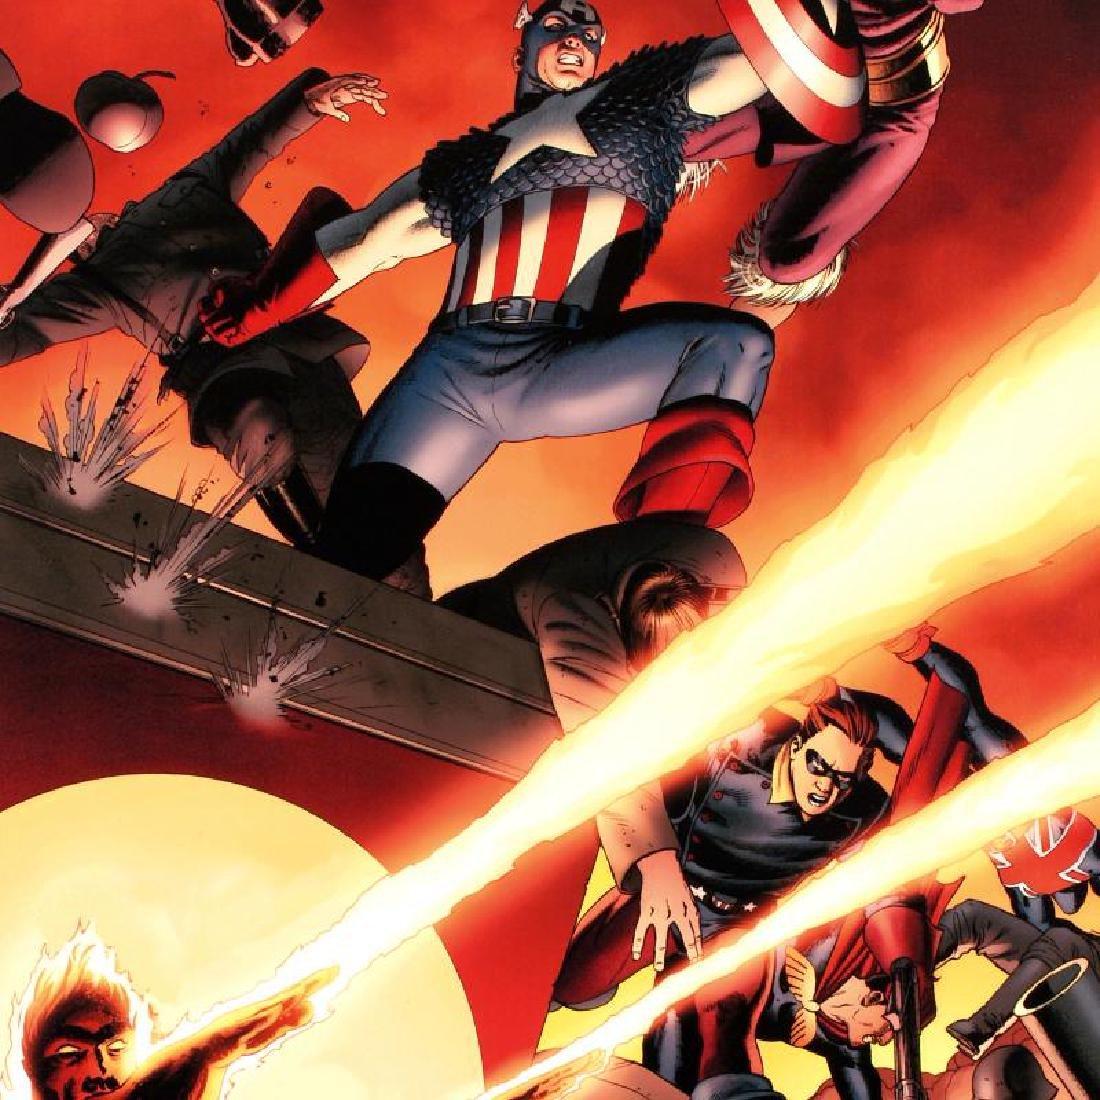 Fallen Son: Death of Captain America #5 by Stan Lee - - 2